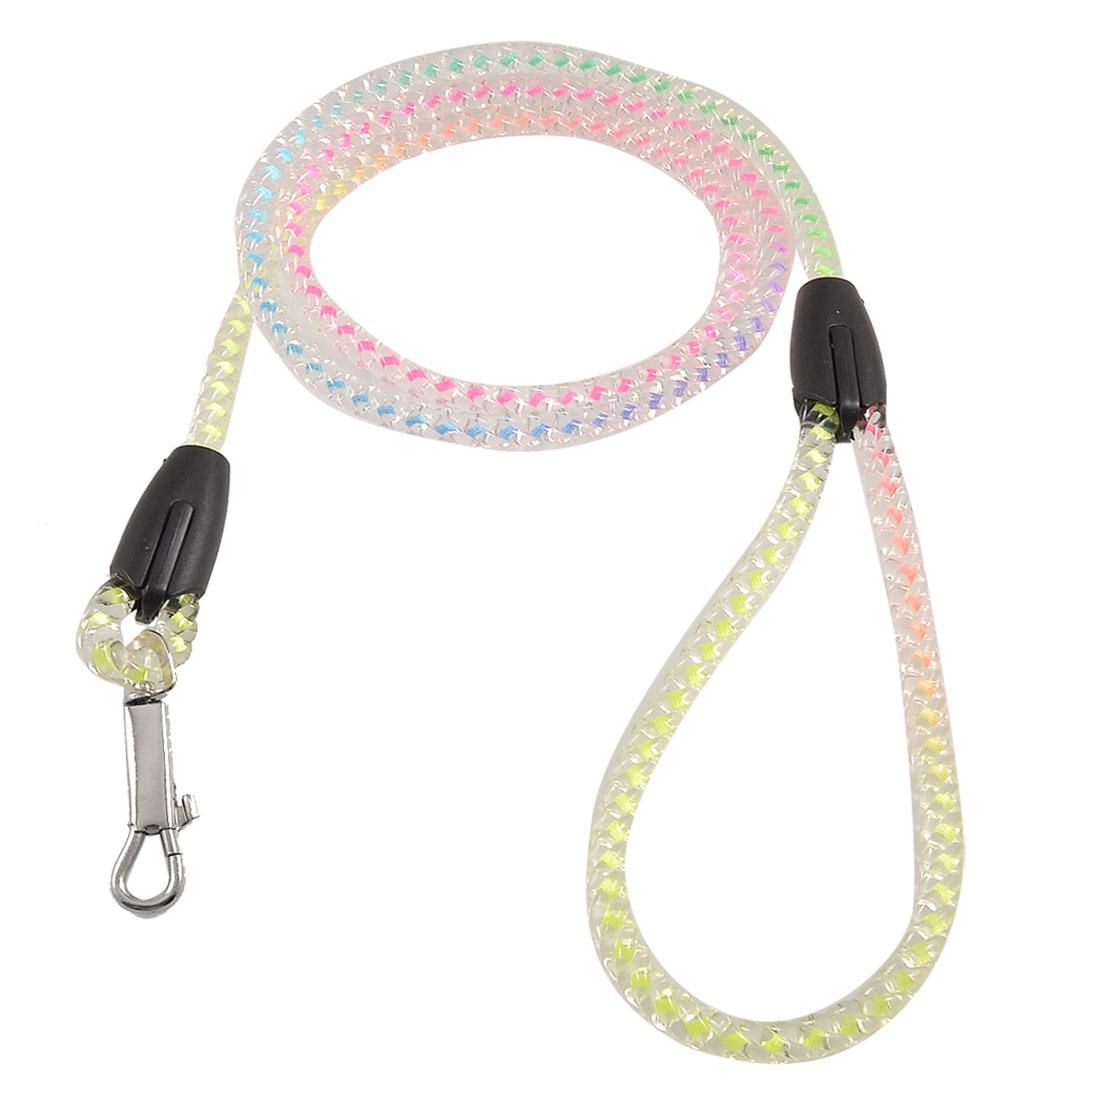 Multicolor Plastic Crystal Twisted Rope Pet Doggie Dog Lead Leash 1.15M 3.8ft